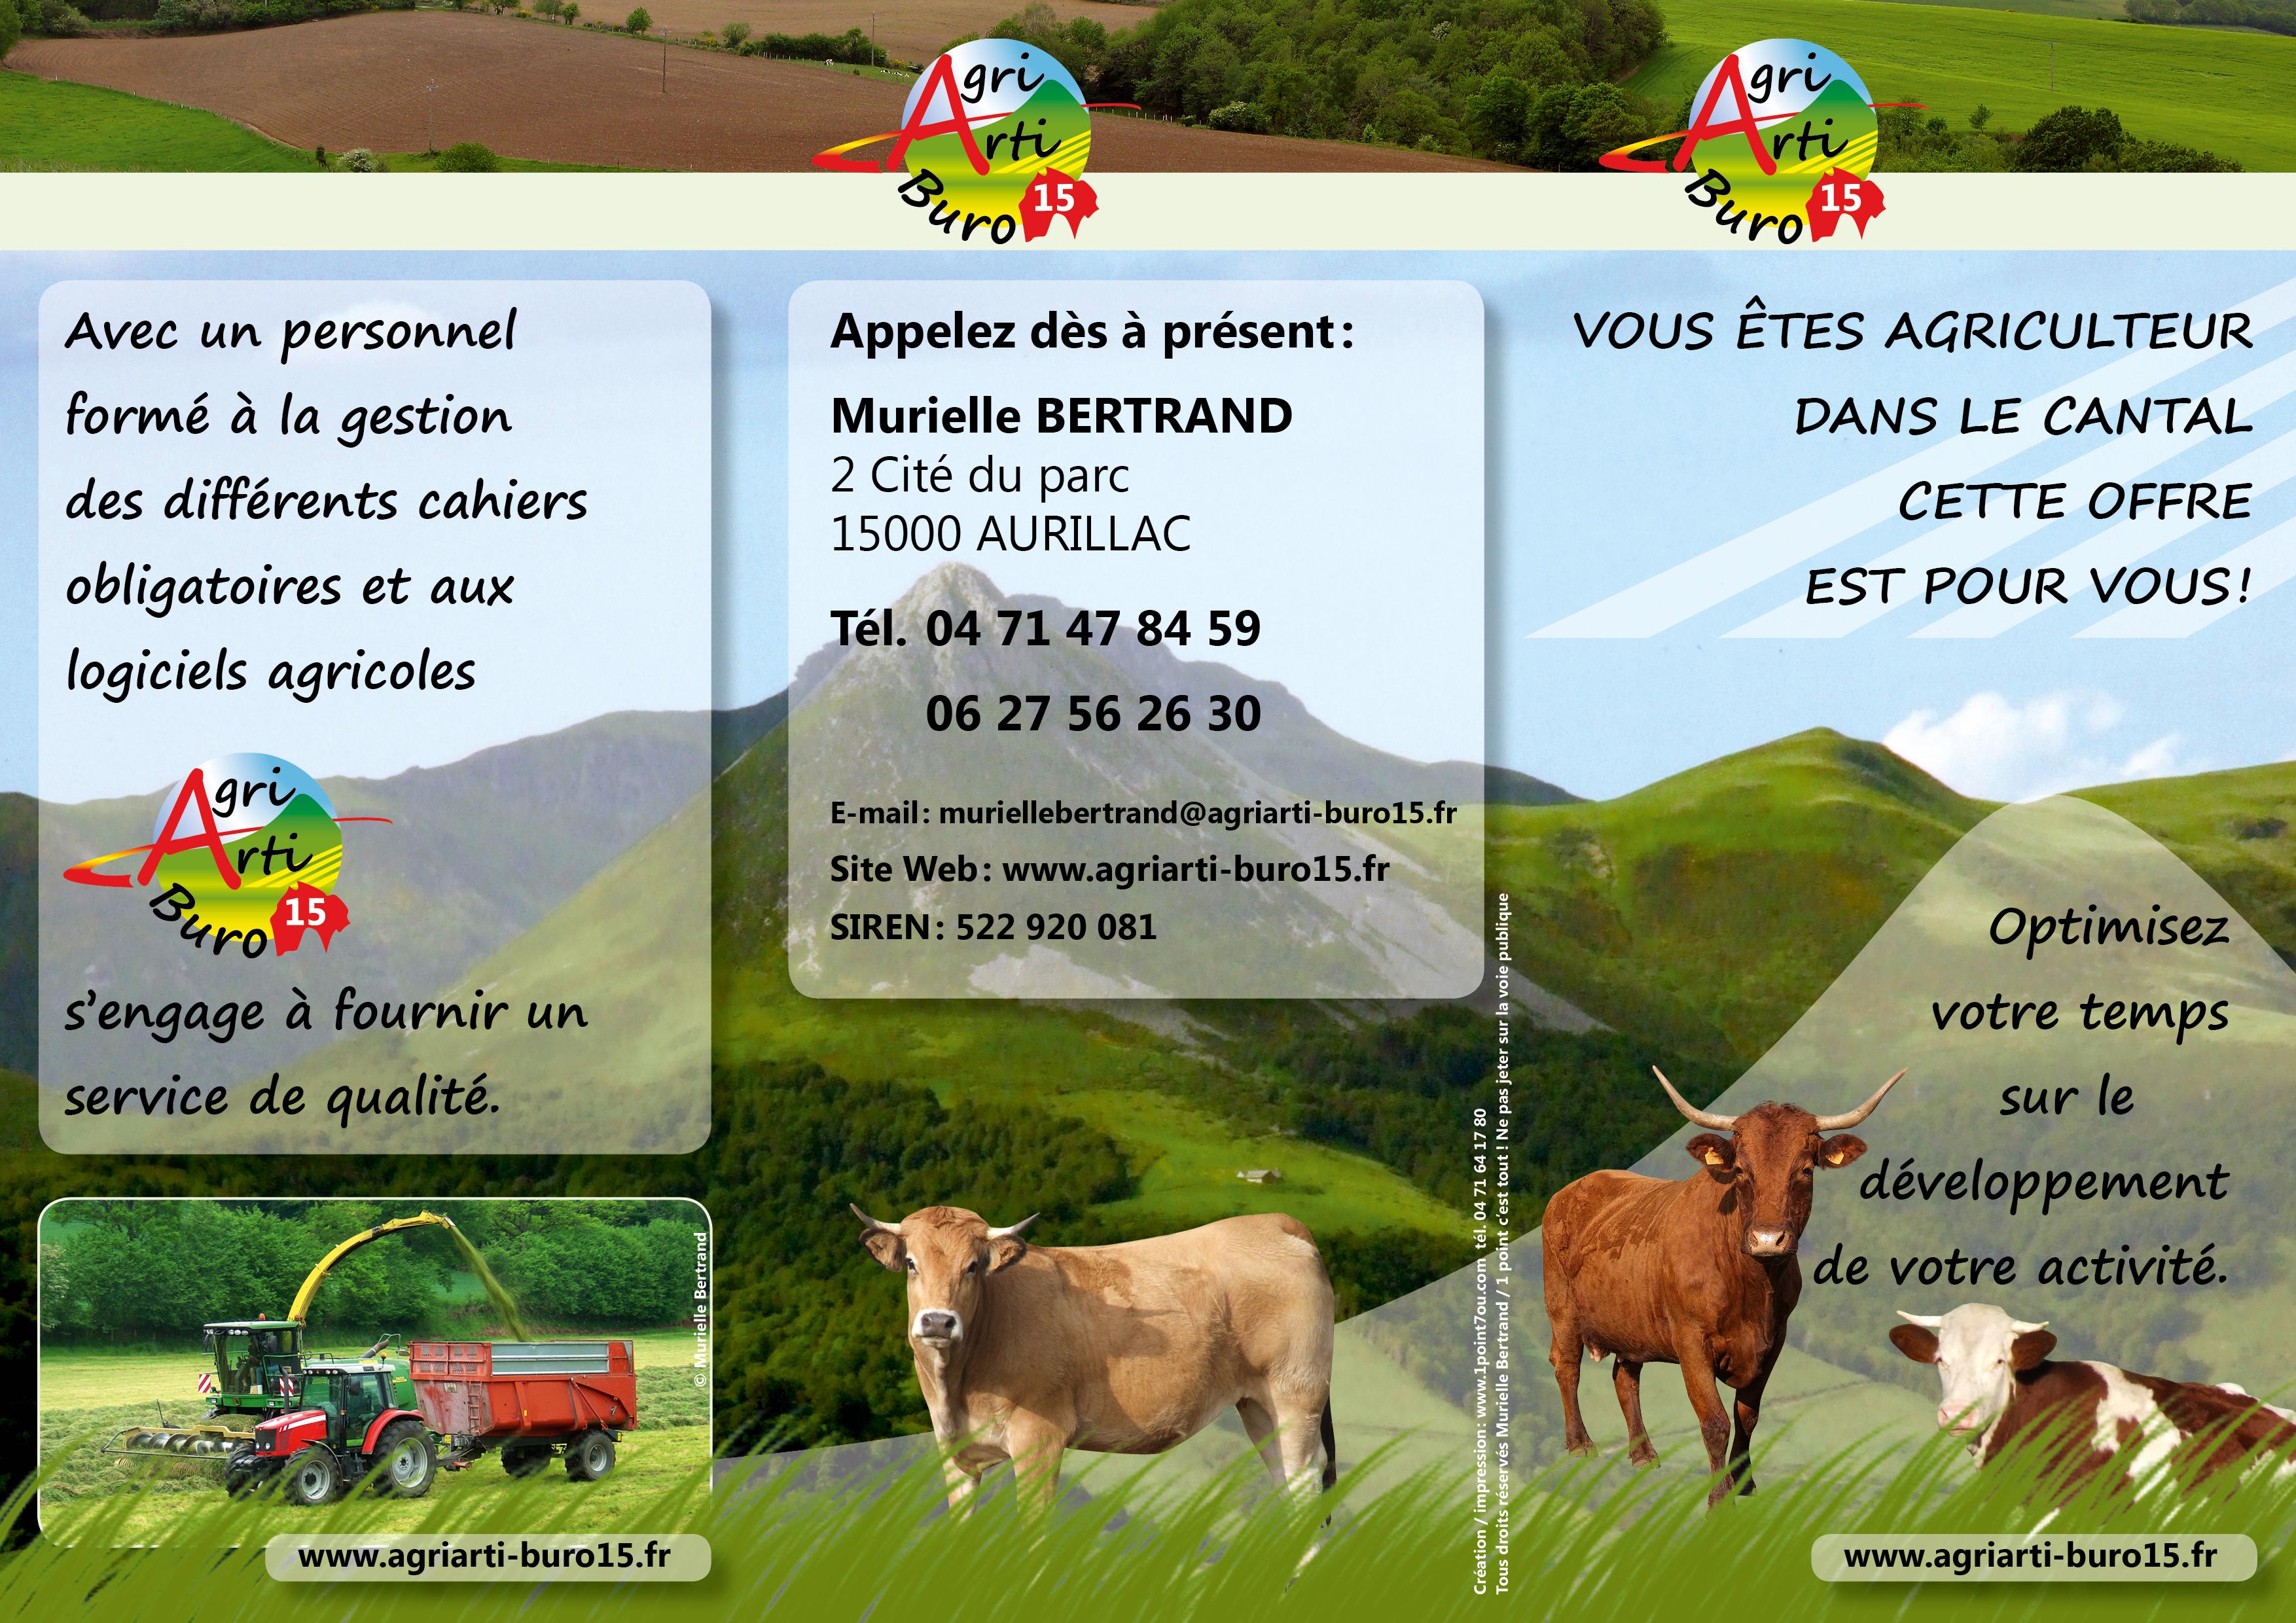 AGRI ARTI BURO 15